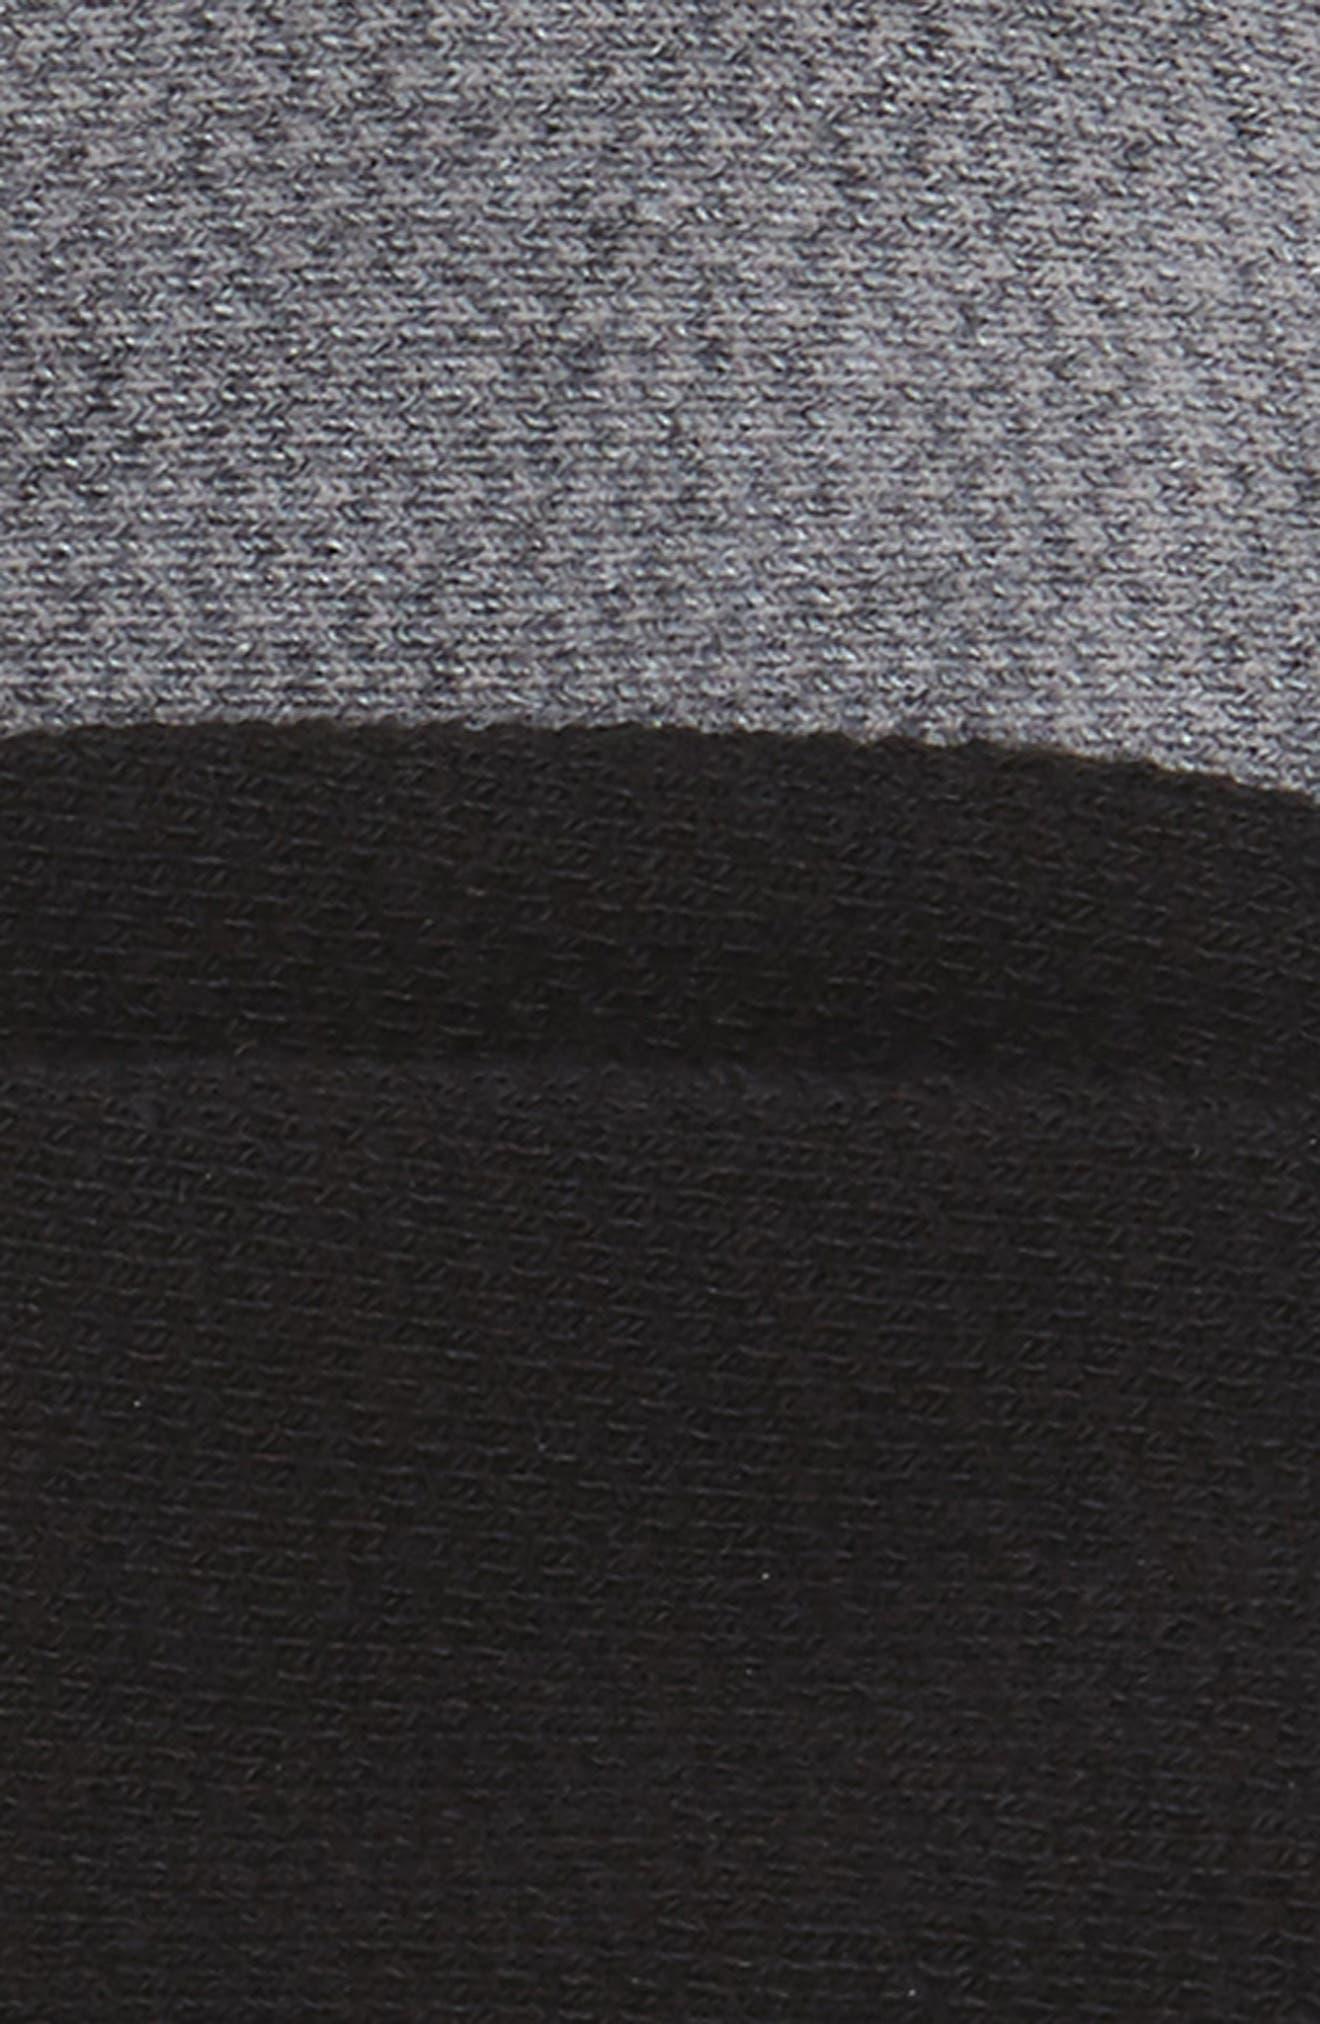 Alternate Image 2  - Nordstrom Men's Shop 2-Pack Performance Liner Socks (3 for $30)